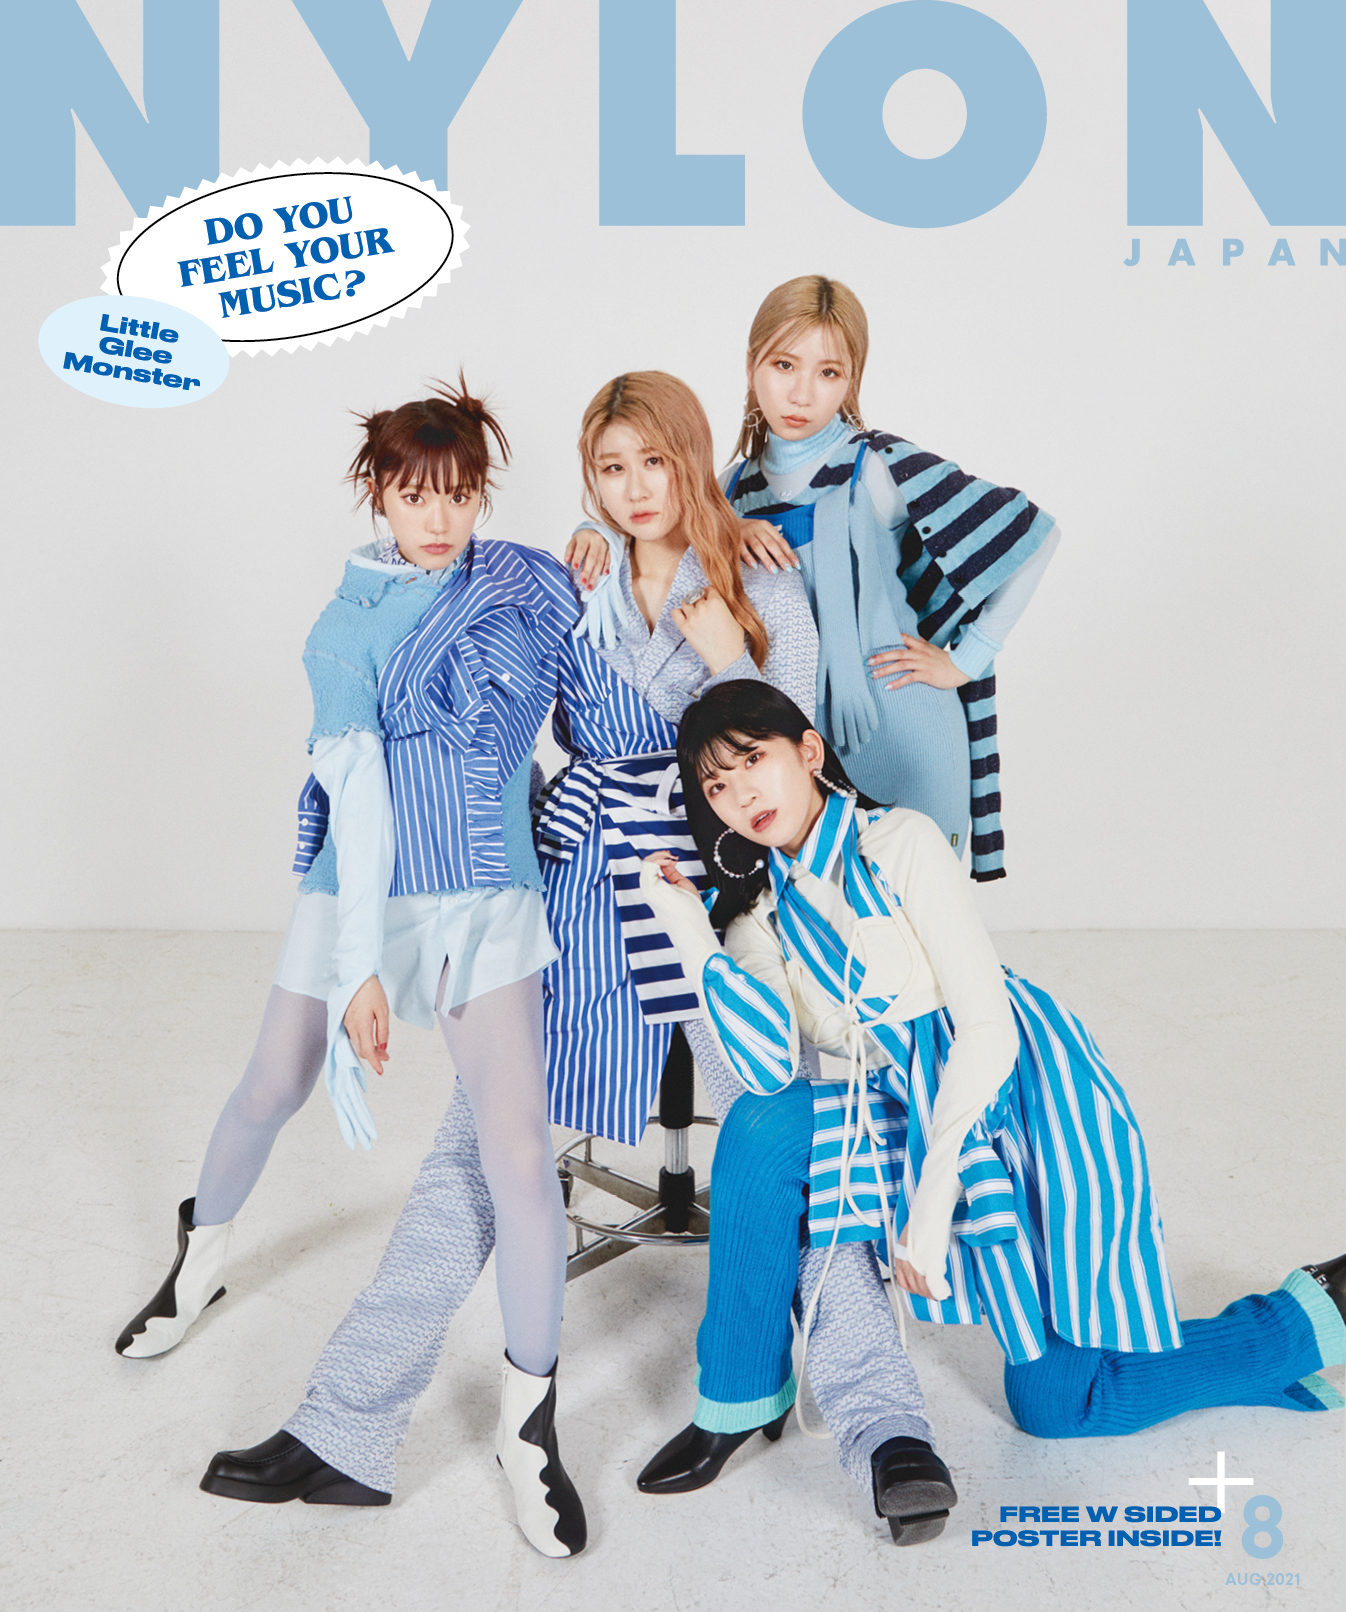 NYLON JAPAN 8月号 Amazon限定版表紙 Little Glee Monster